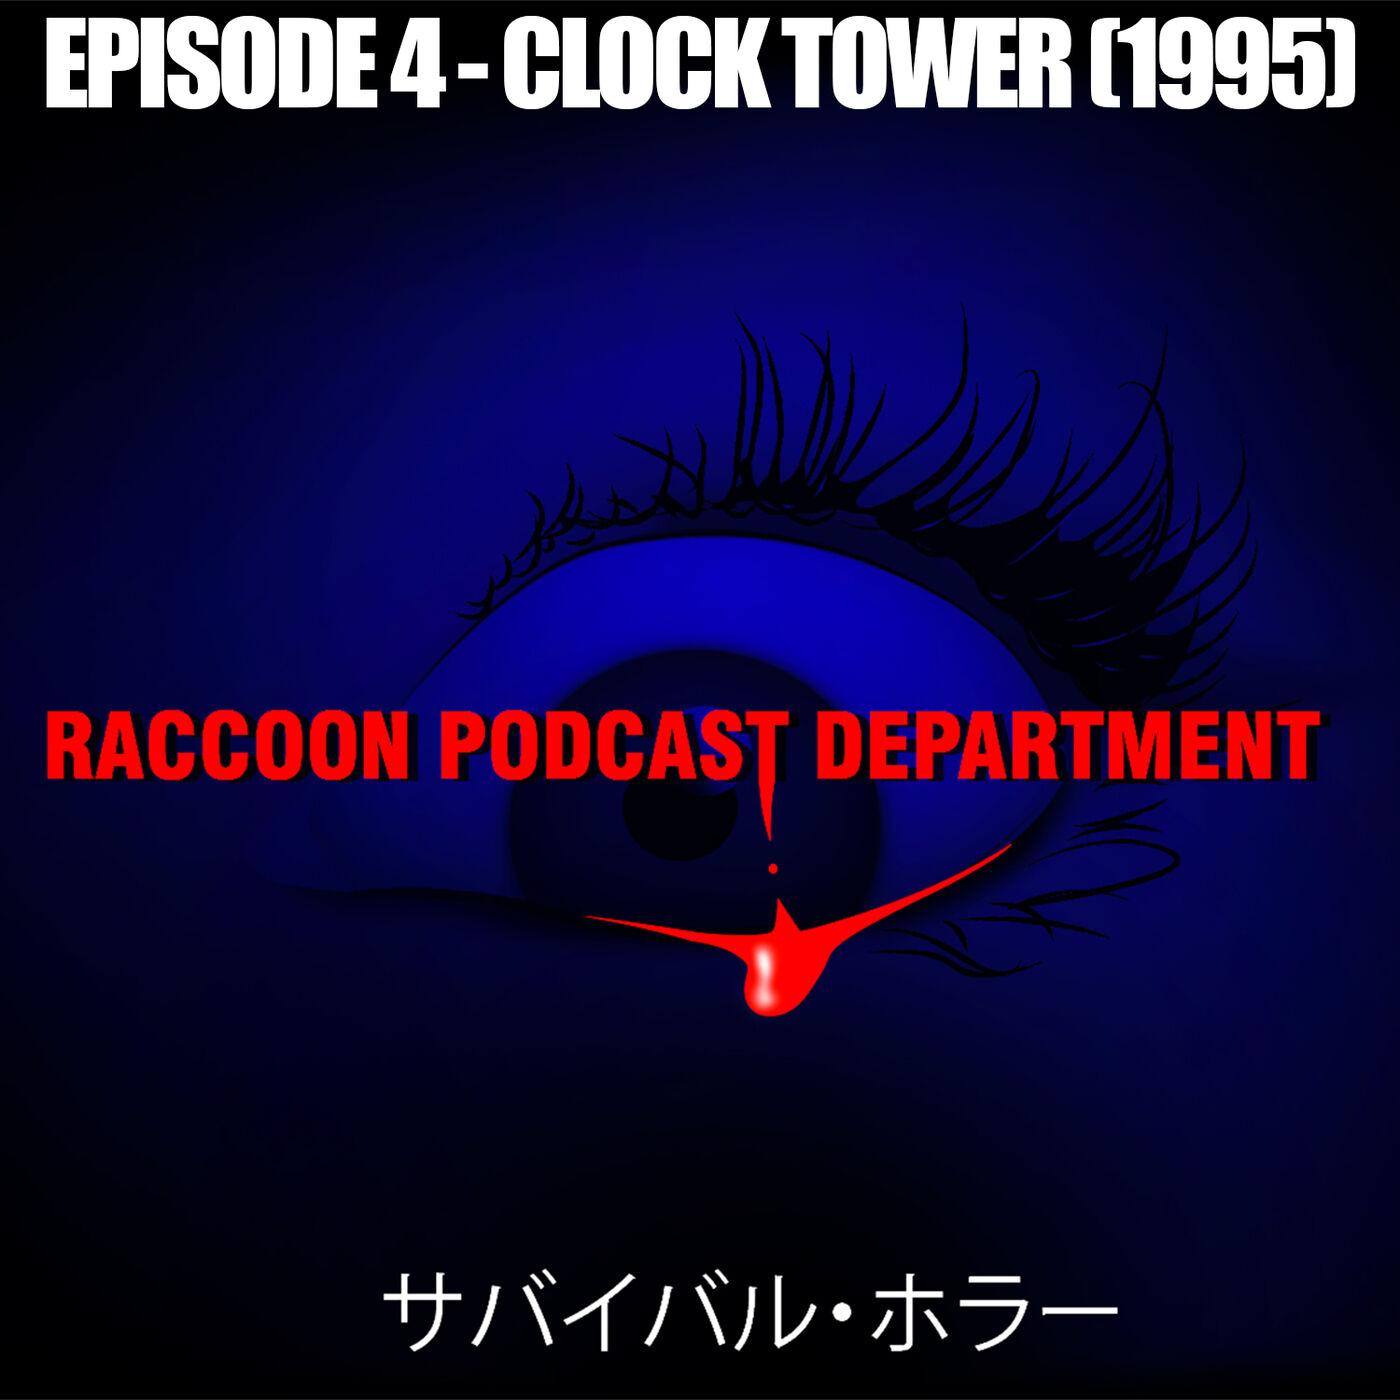 Clock Tower (1995)